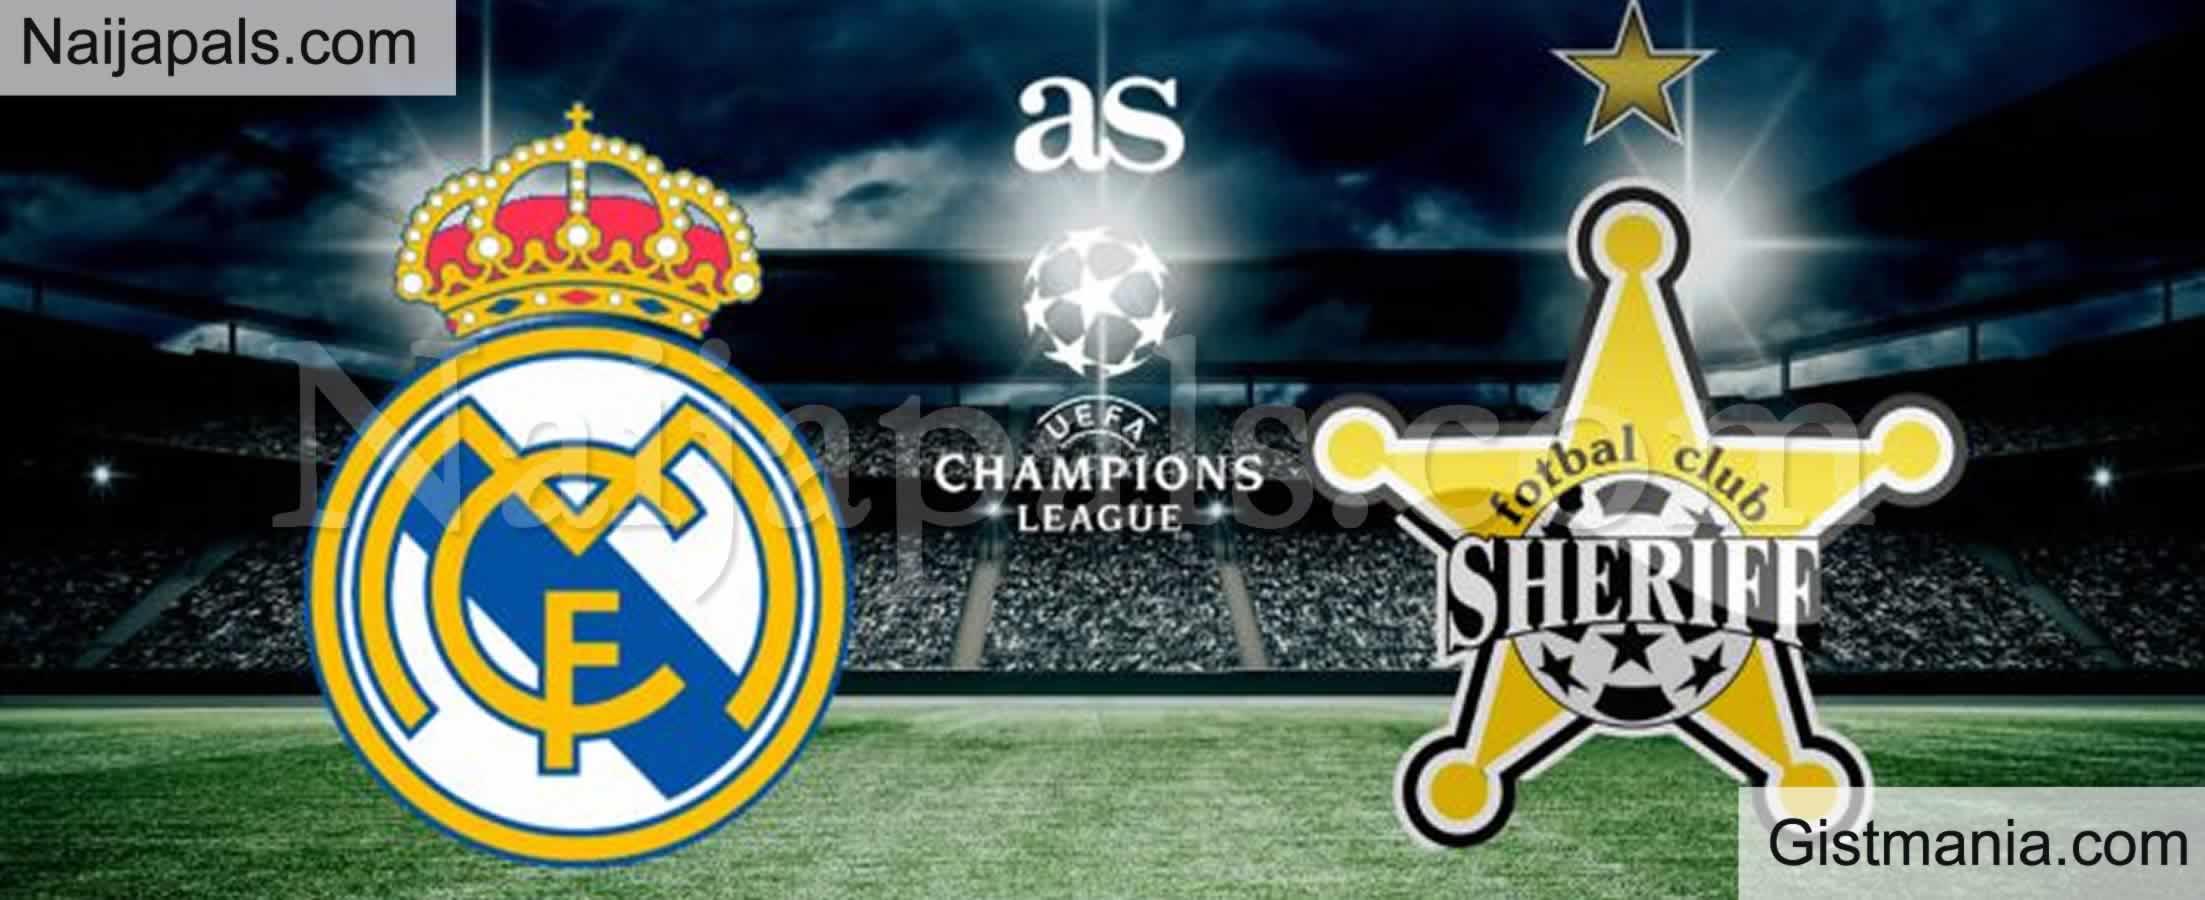 <img alt='.' class='lazyload' data-src='https://img.gistmania.com/emot/soccer.gif' /> <b>Real Madrid v FC Sheriff : UEFA Champion's League Match, Team News, Goal Scorers and Stats</b>